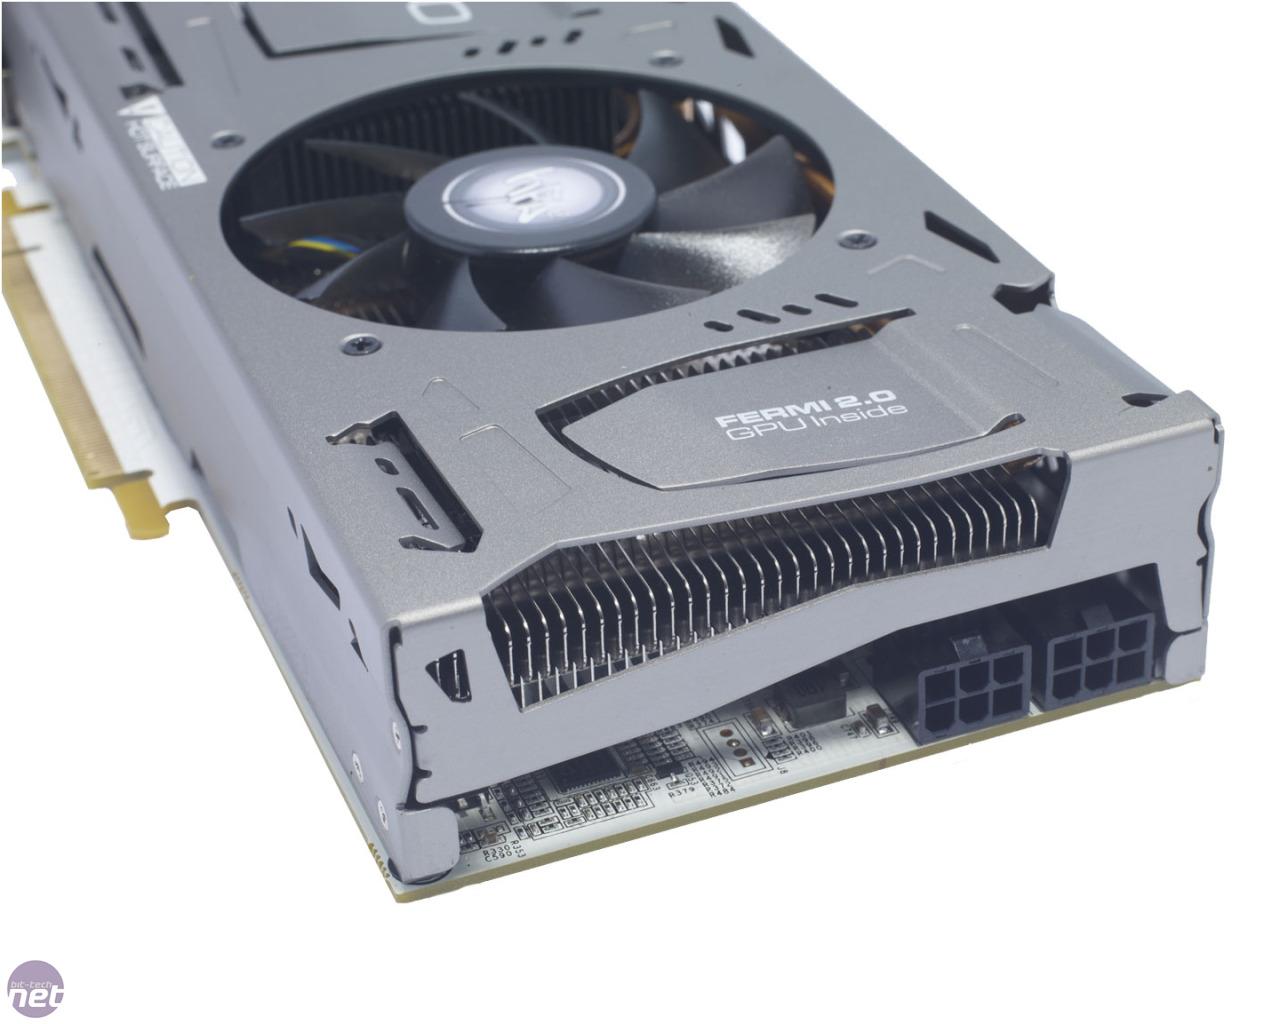 Nvidia Geforce Gtx 560 Ti Windows 10 Driver